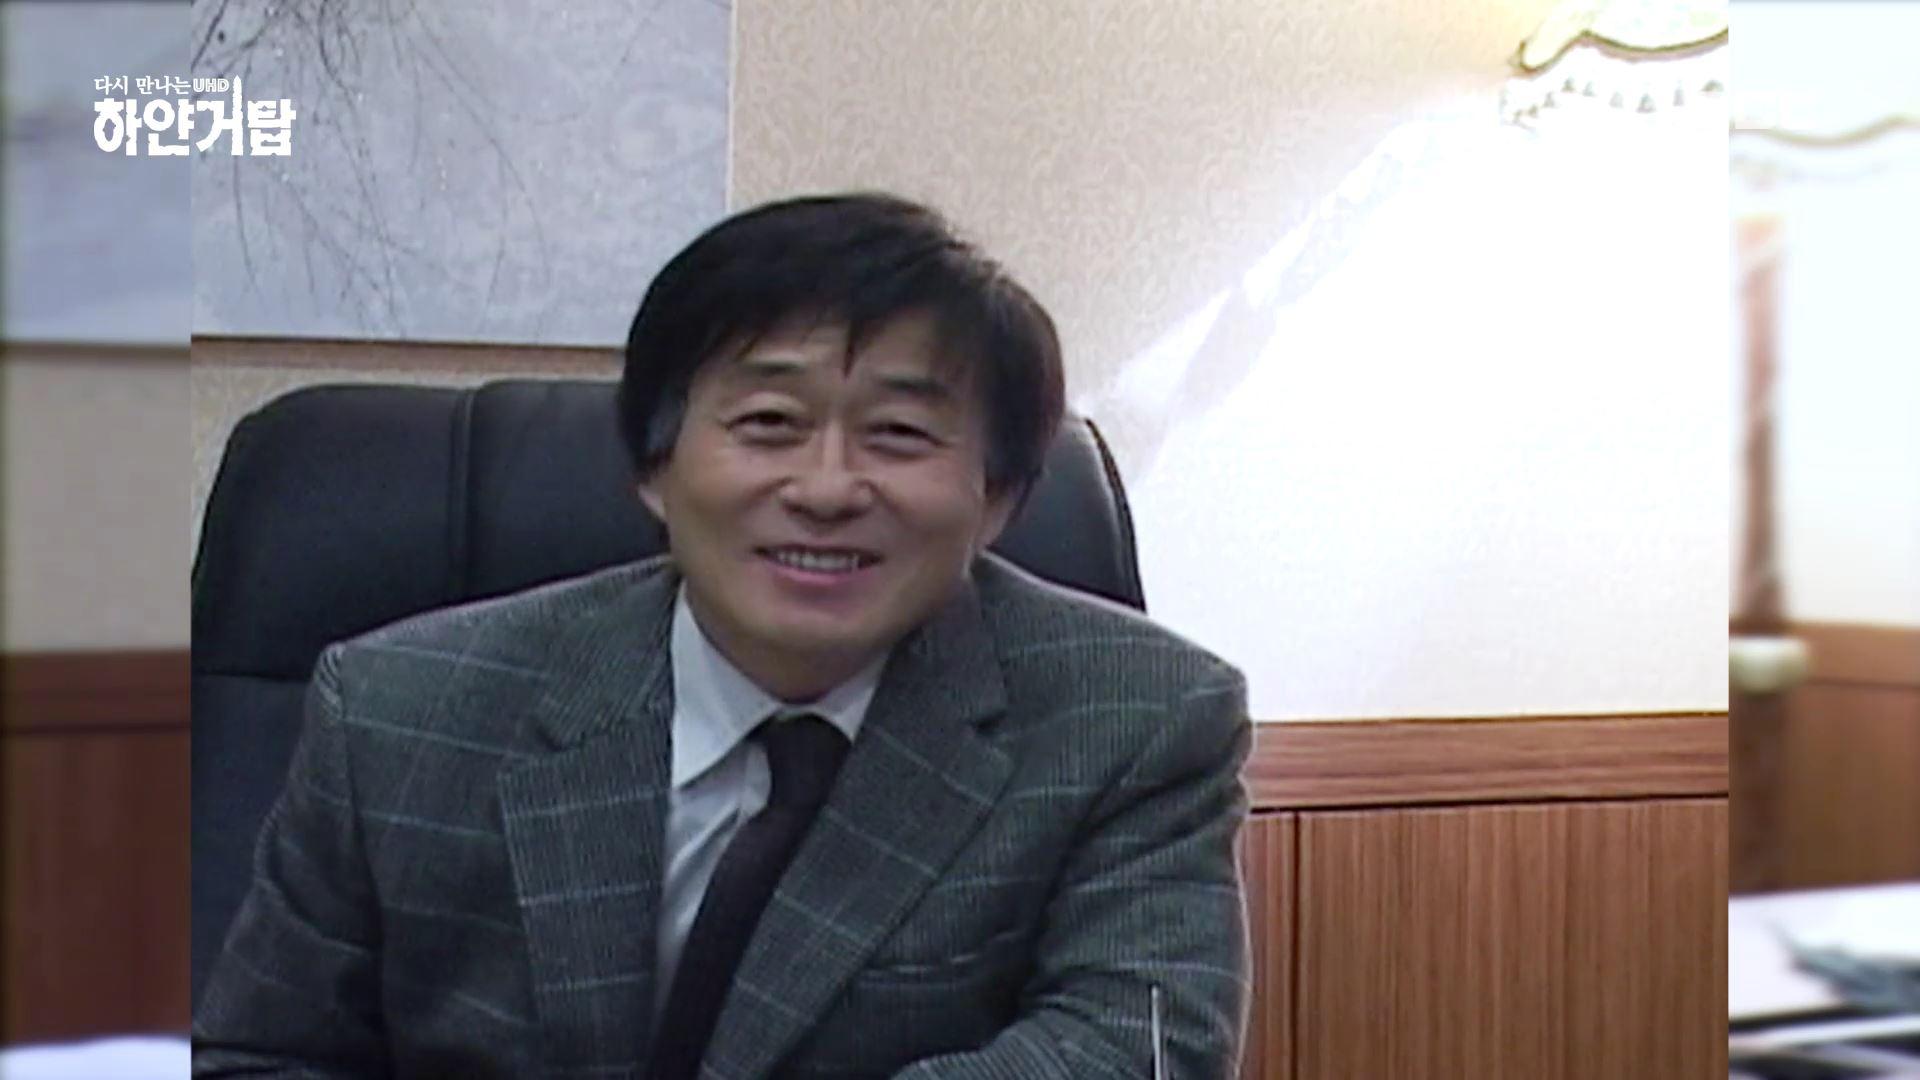 [M플레이] 김창완, 11년 전 인터뷰 공개! #악역 #포스 #황금돼지해